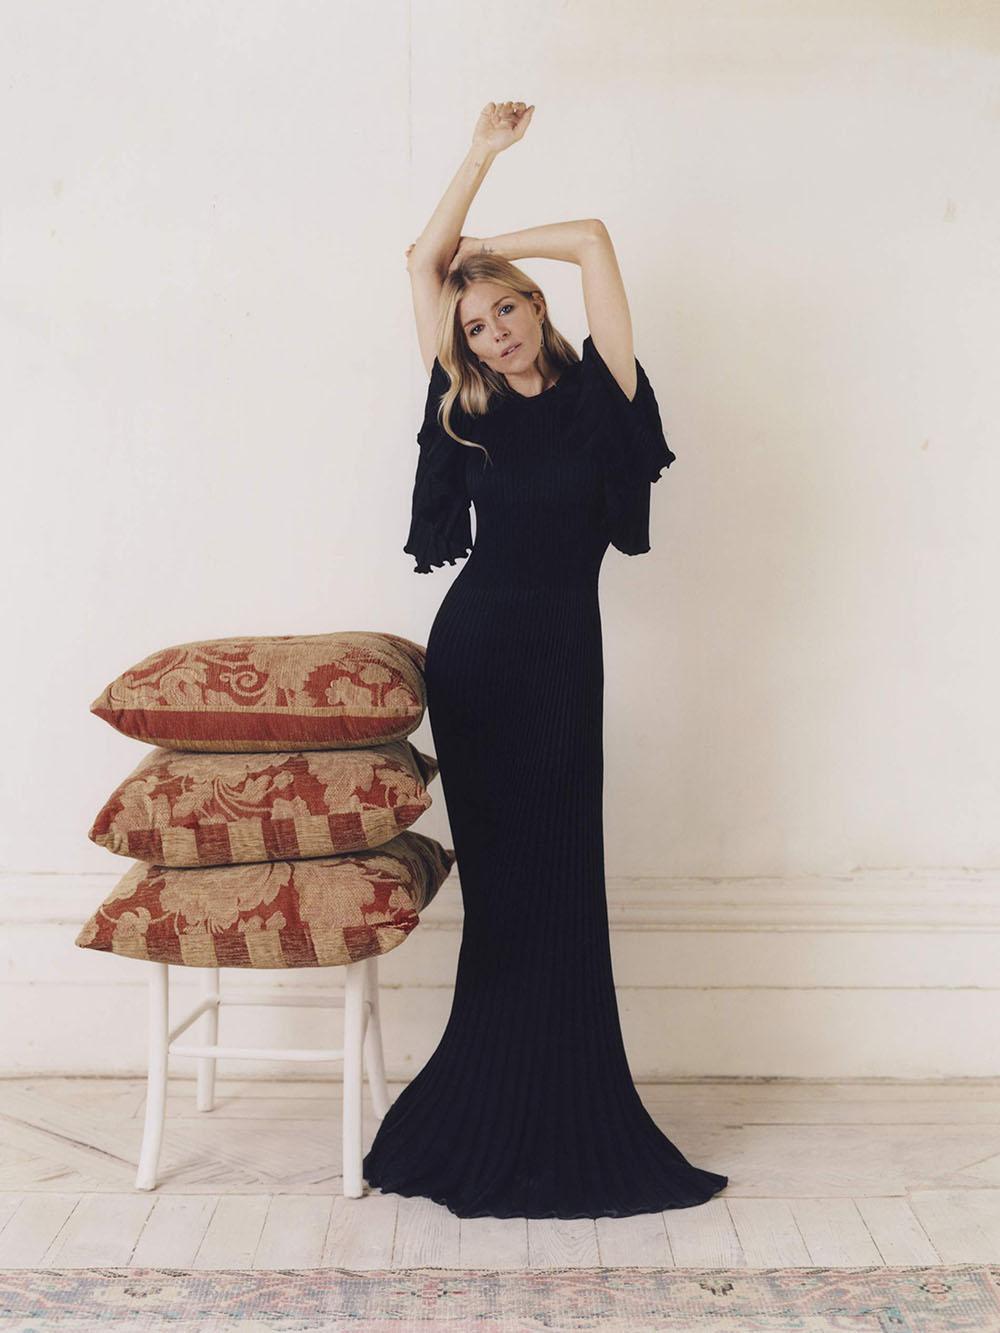 Sienna Miller covers Porter Magazine November 2nd, 2020 by Juliette Cassidy